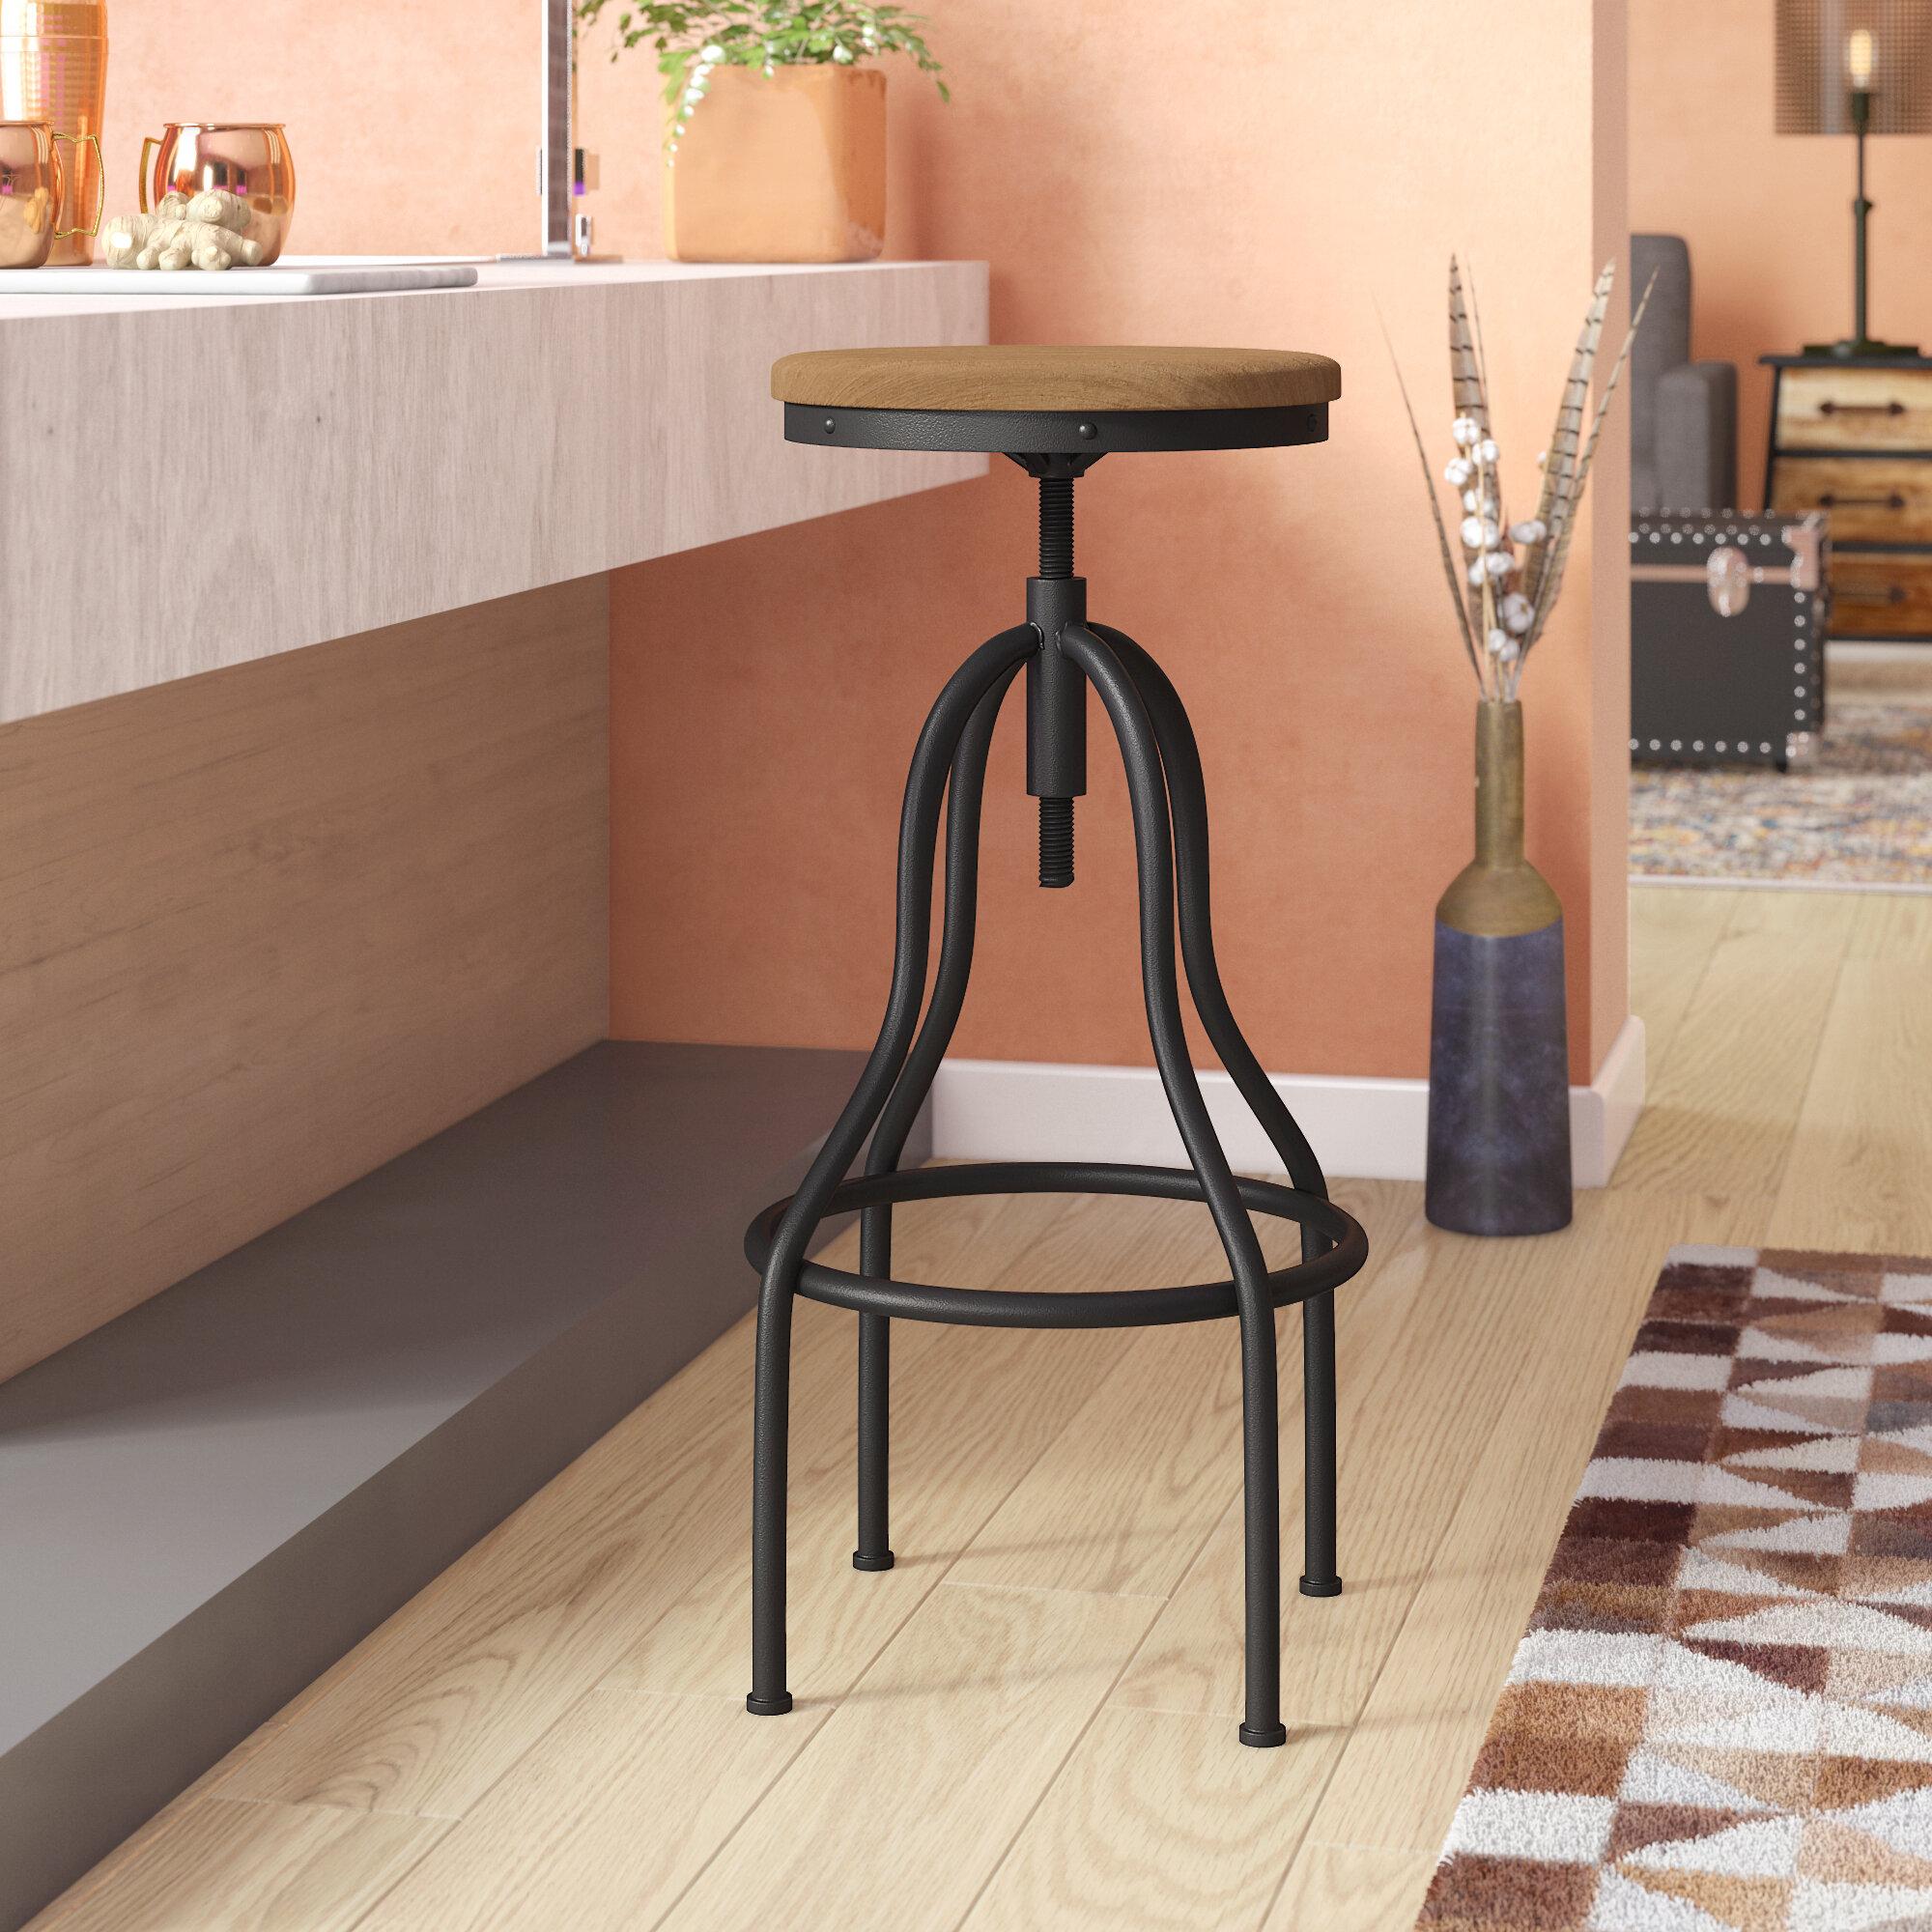 Beau Trent Austin Design South Lake Tahoe Adjustable Height Swivel Bar Stool U0026  Reviews   Wayfair